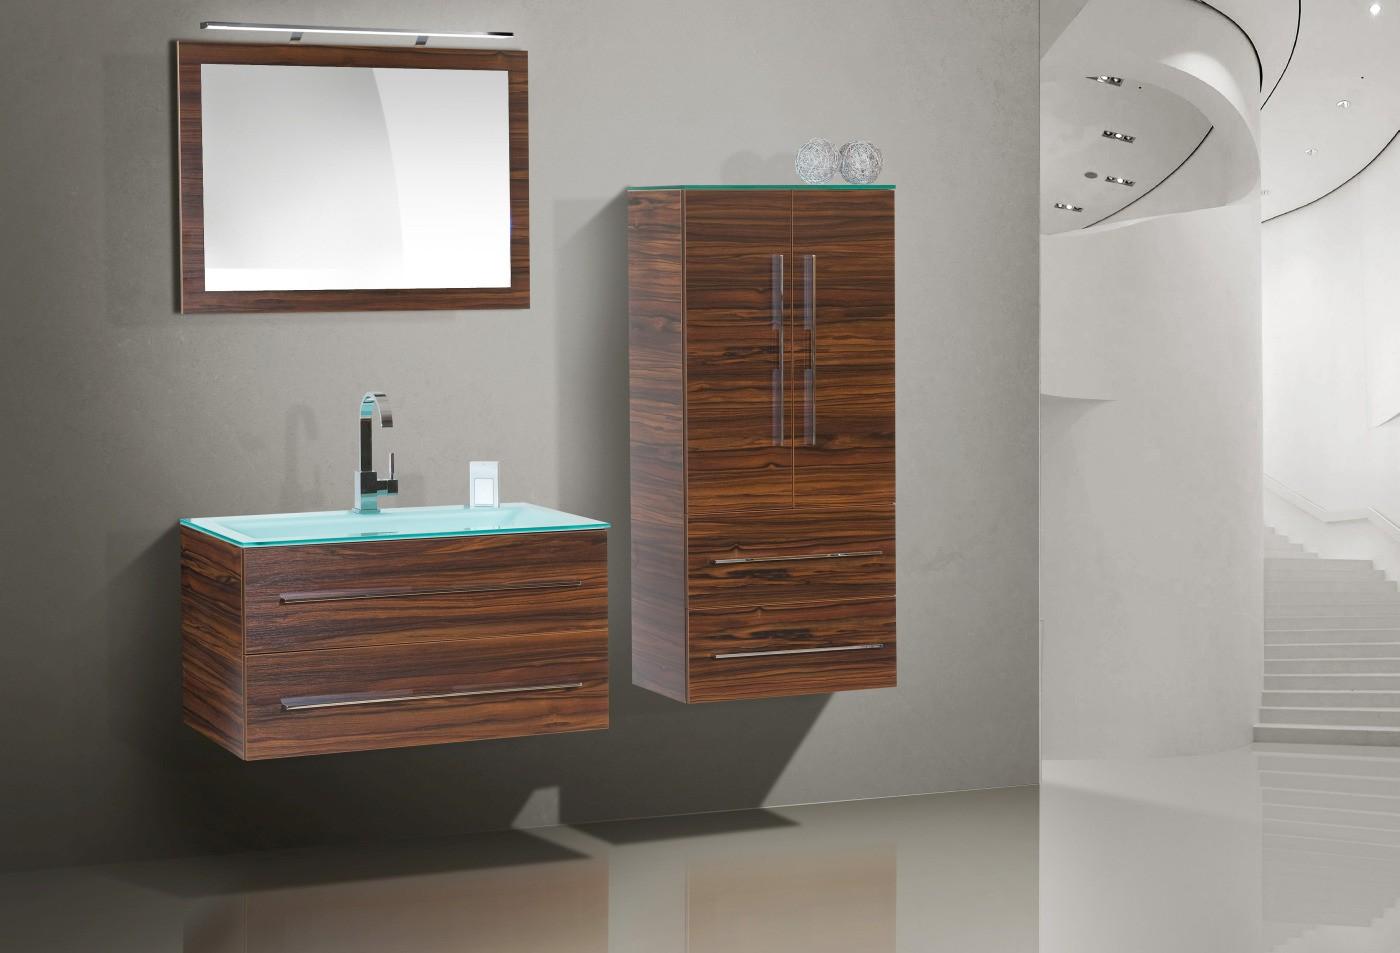 badm bel set mit glaswaschtisch 90 cm 465. Black Bedroom Furniture Sets. Home Design Ideas